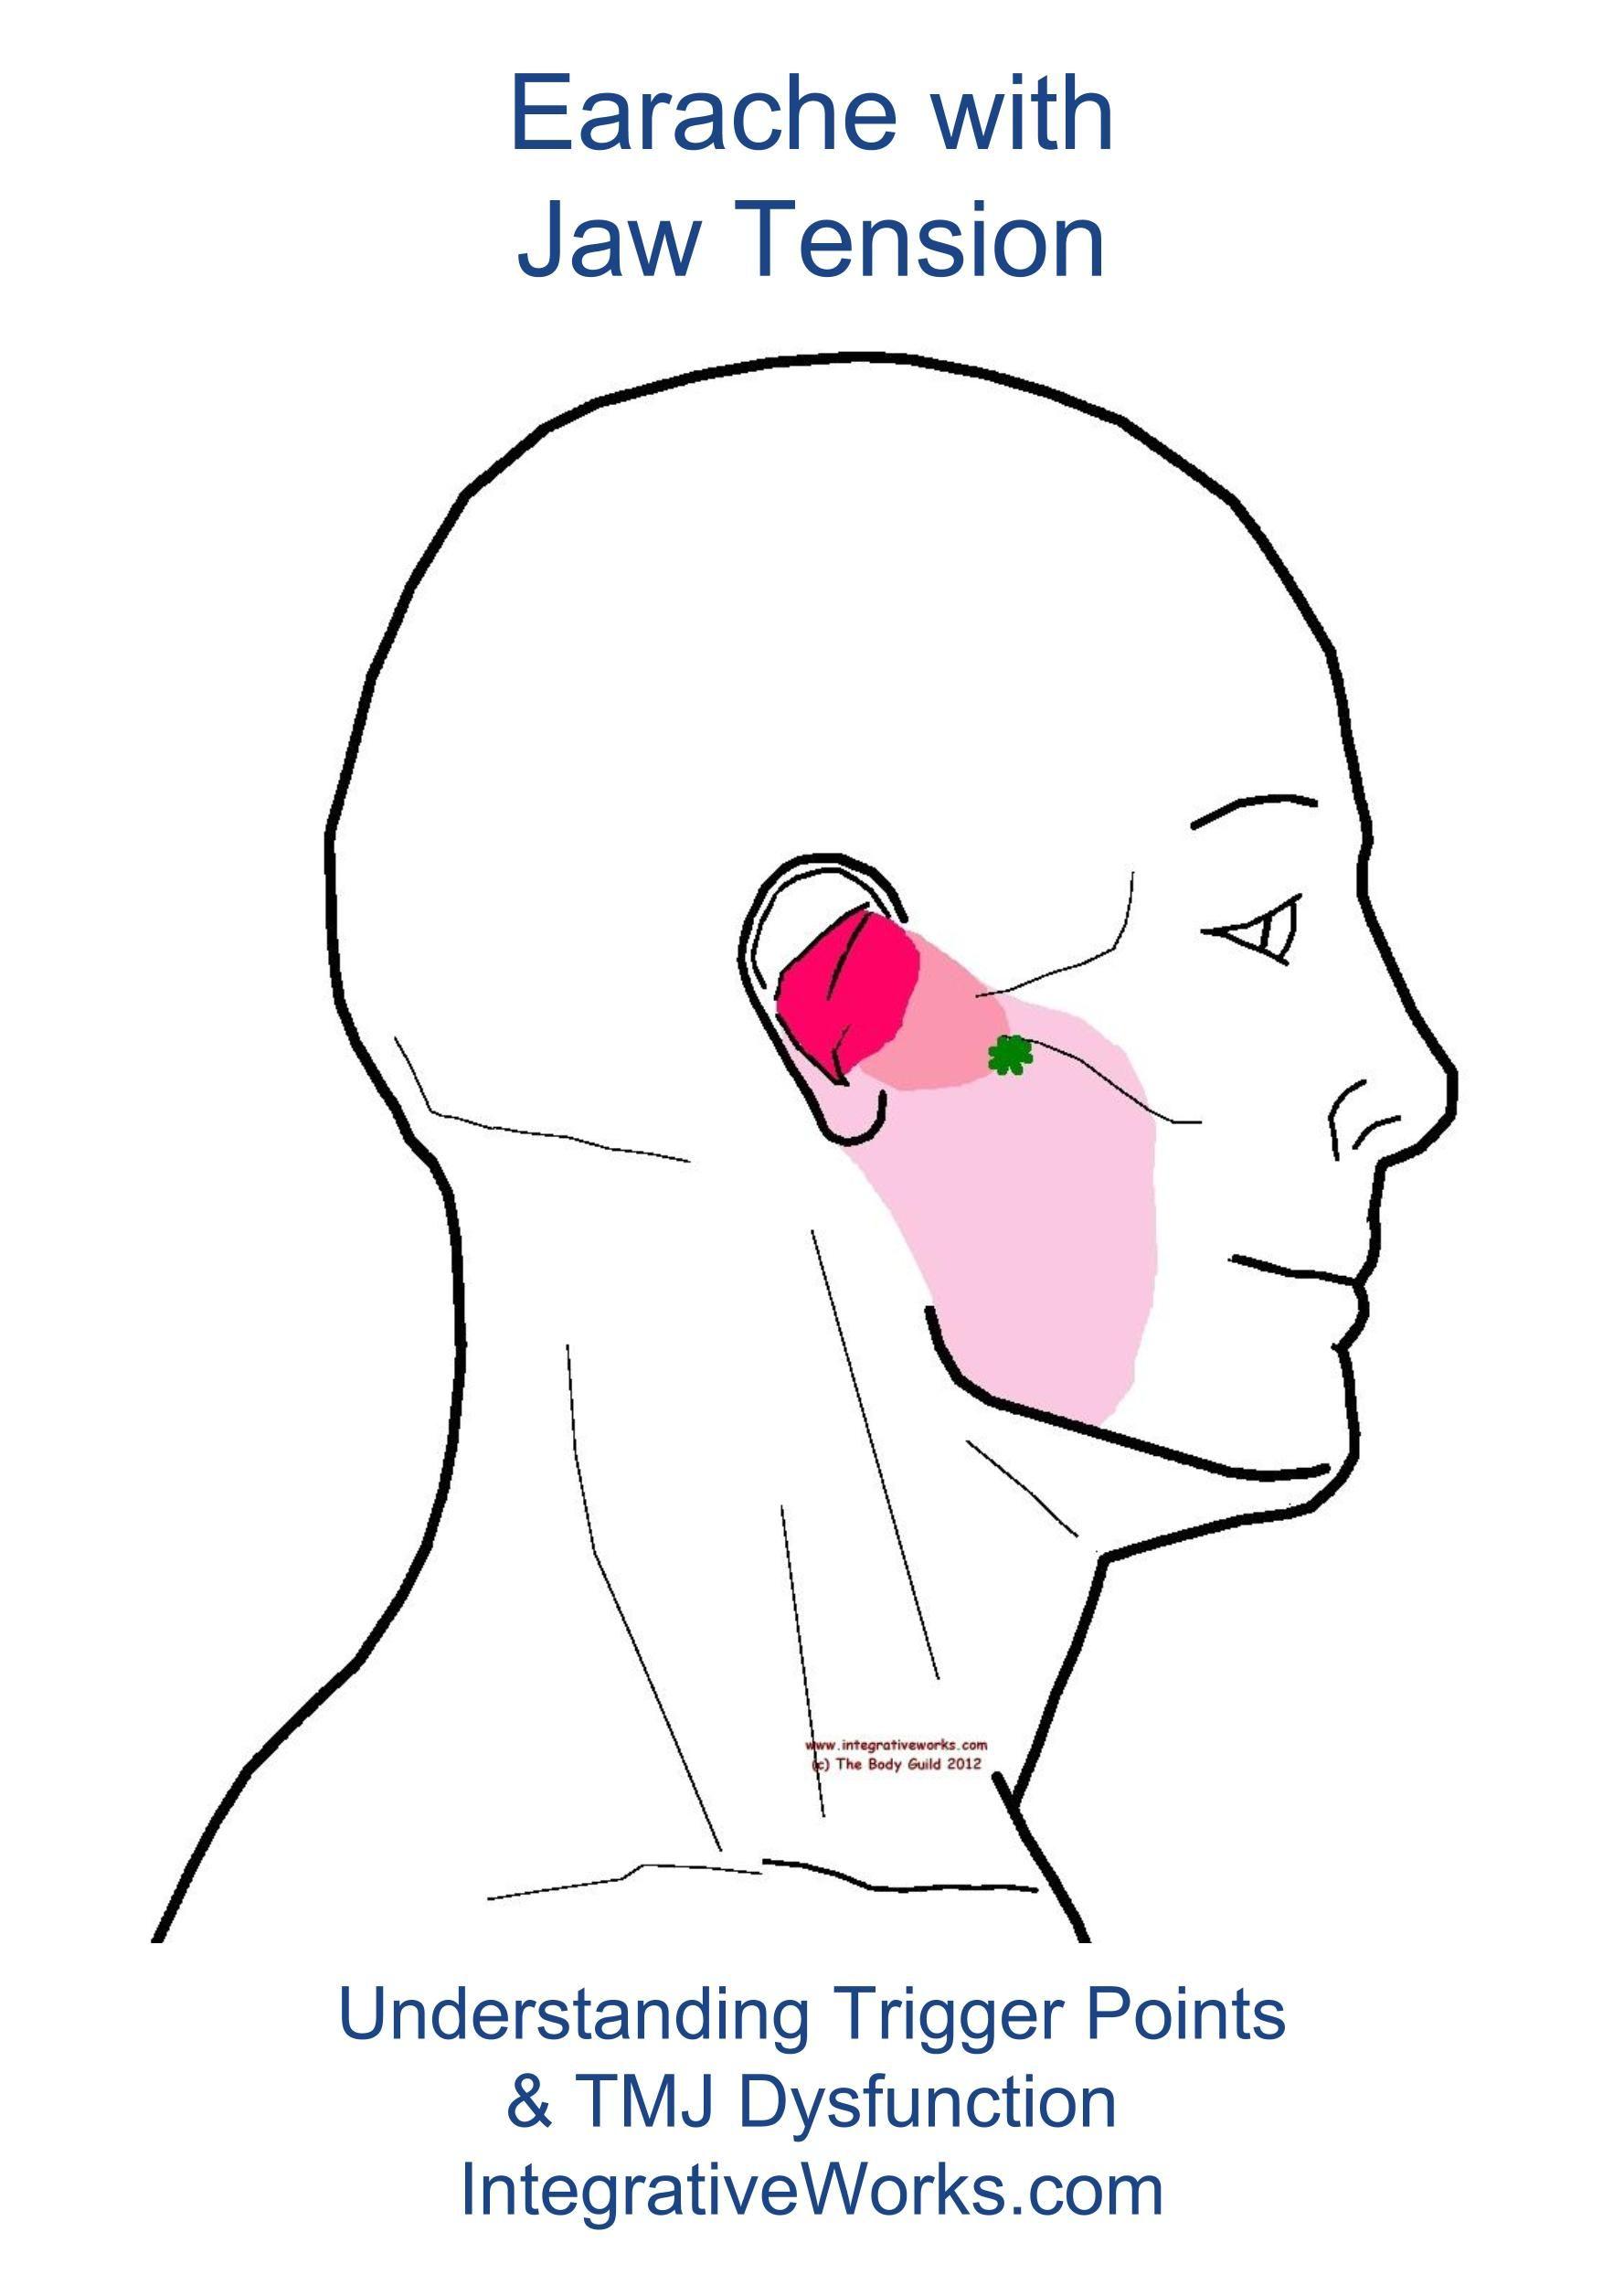 cc643f0ec650ba1819a202f1ee2c375a - How To Get Rid Of Tooth Pain From Sinus Pressure